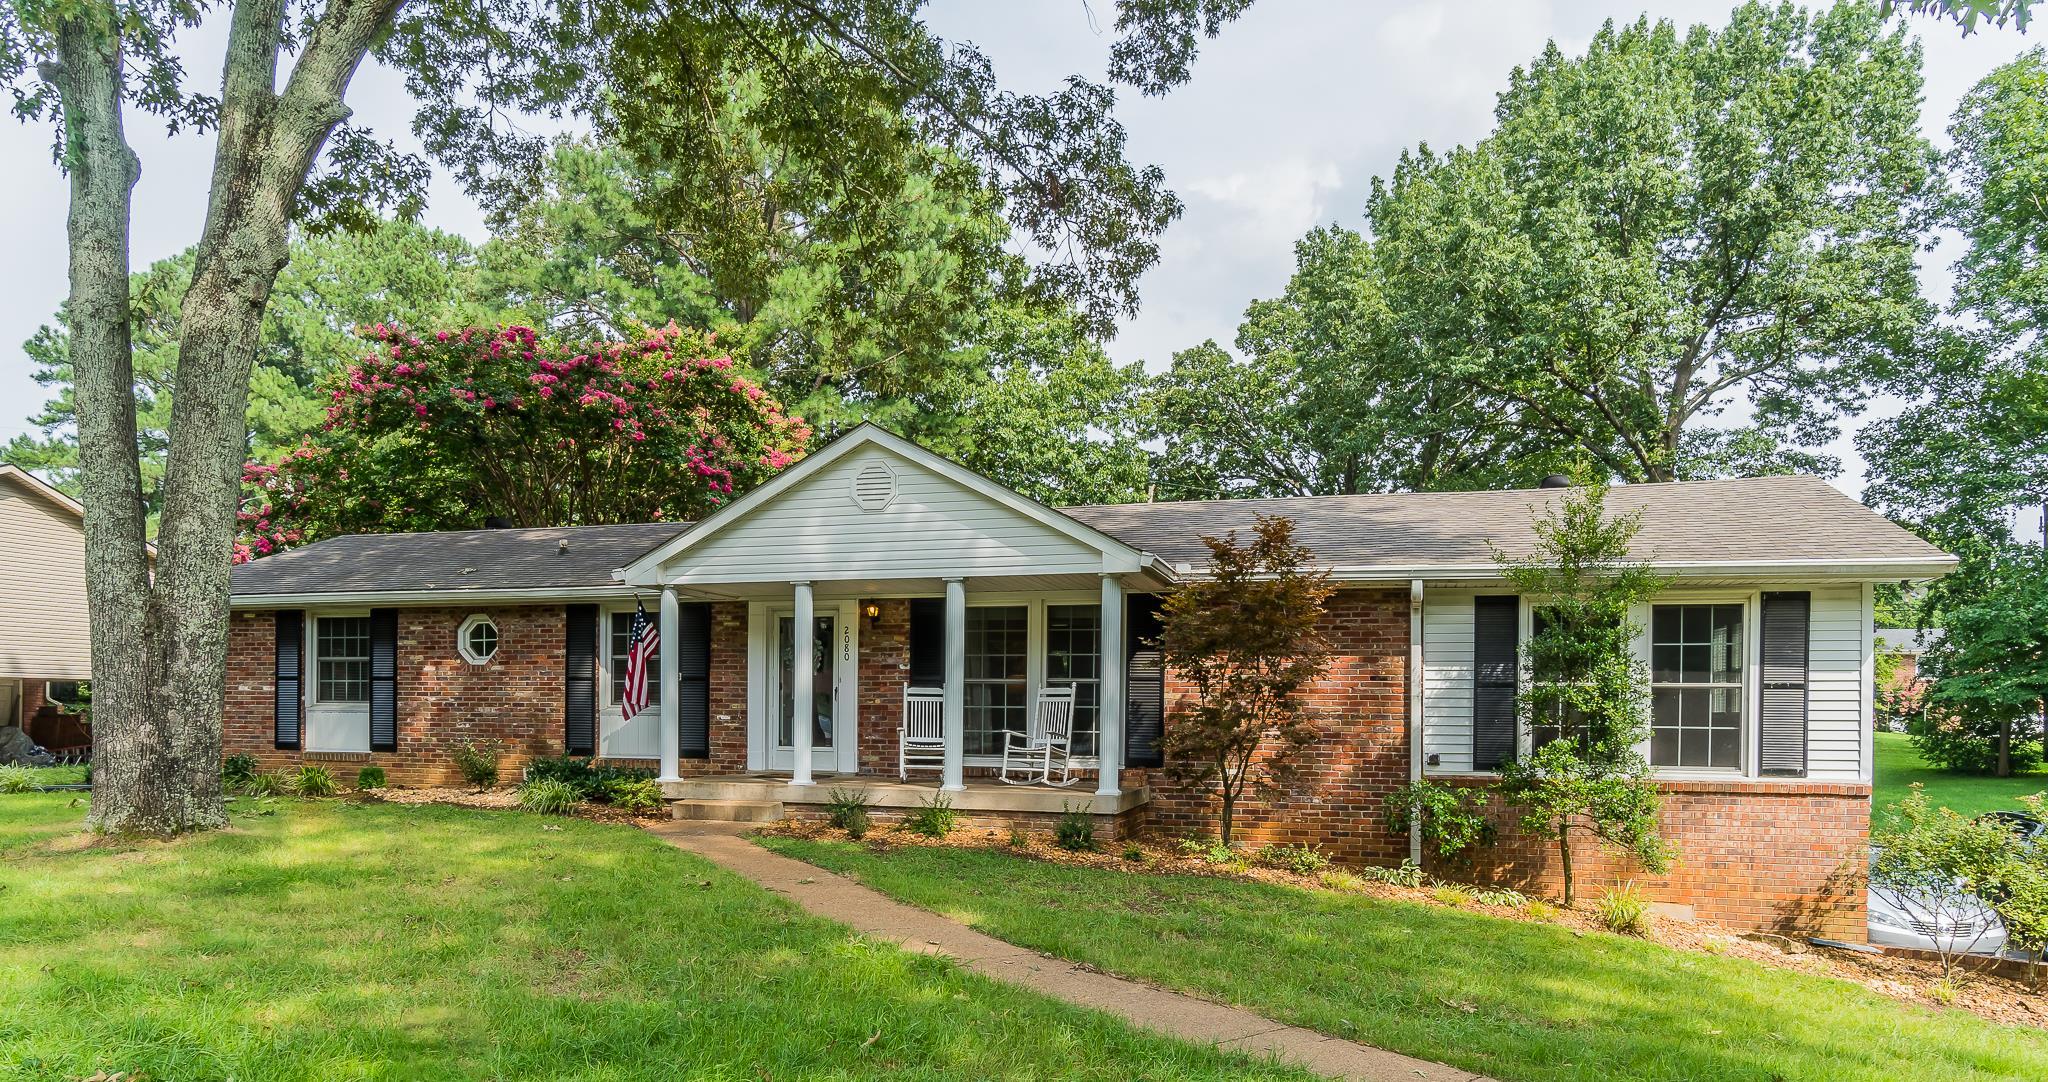 2080 Landon Rd, Clarksville, TN 37043 - Clarksville, TN real estate listing